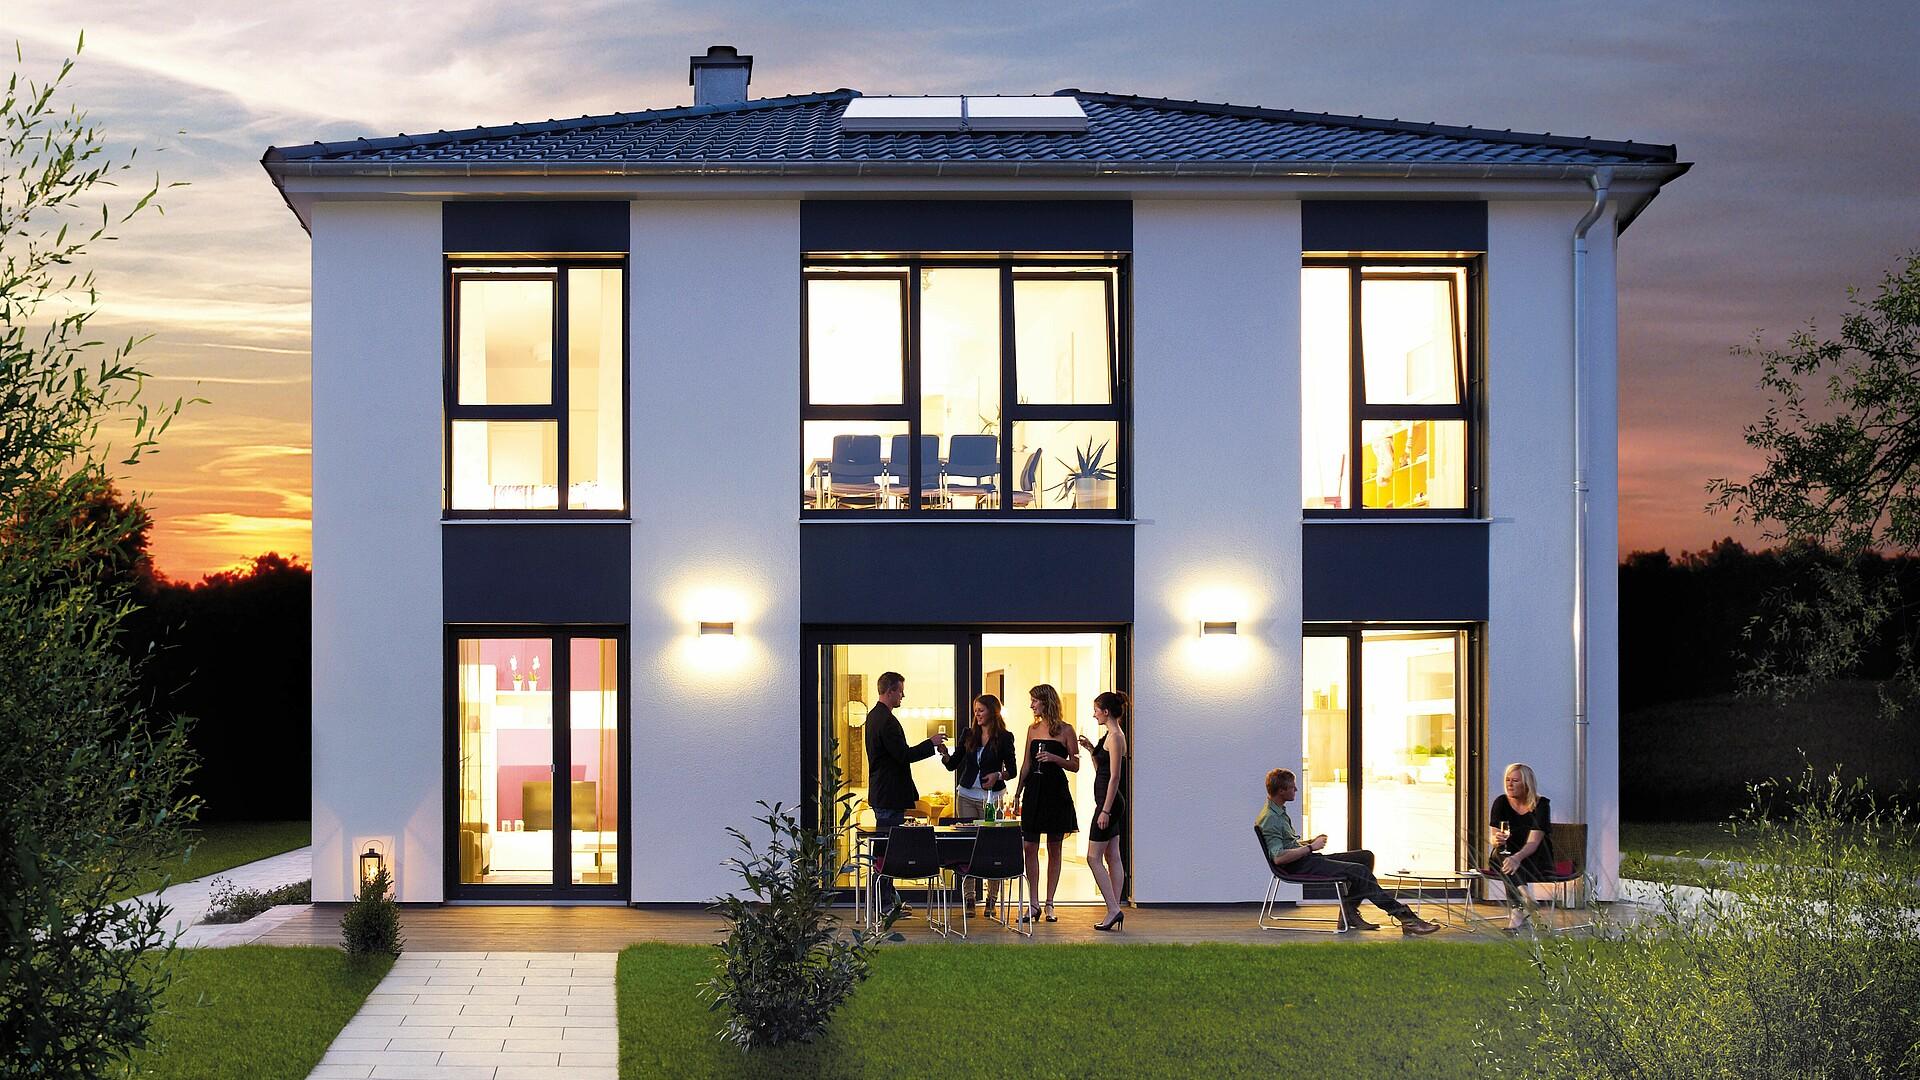 fertighaus villa toskana haus bis stadtvilla hanse haus. Black Bedroom Furniture Sets. Home Design Ideas